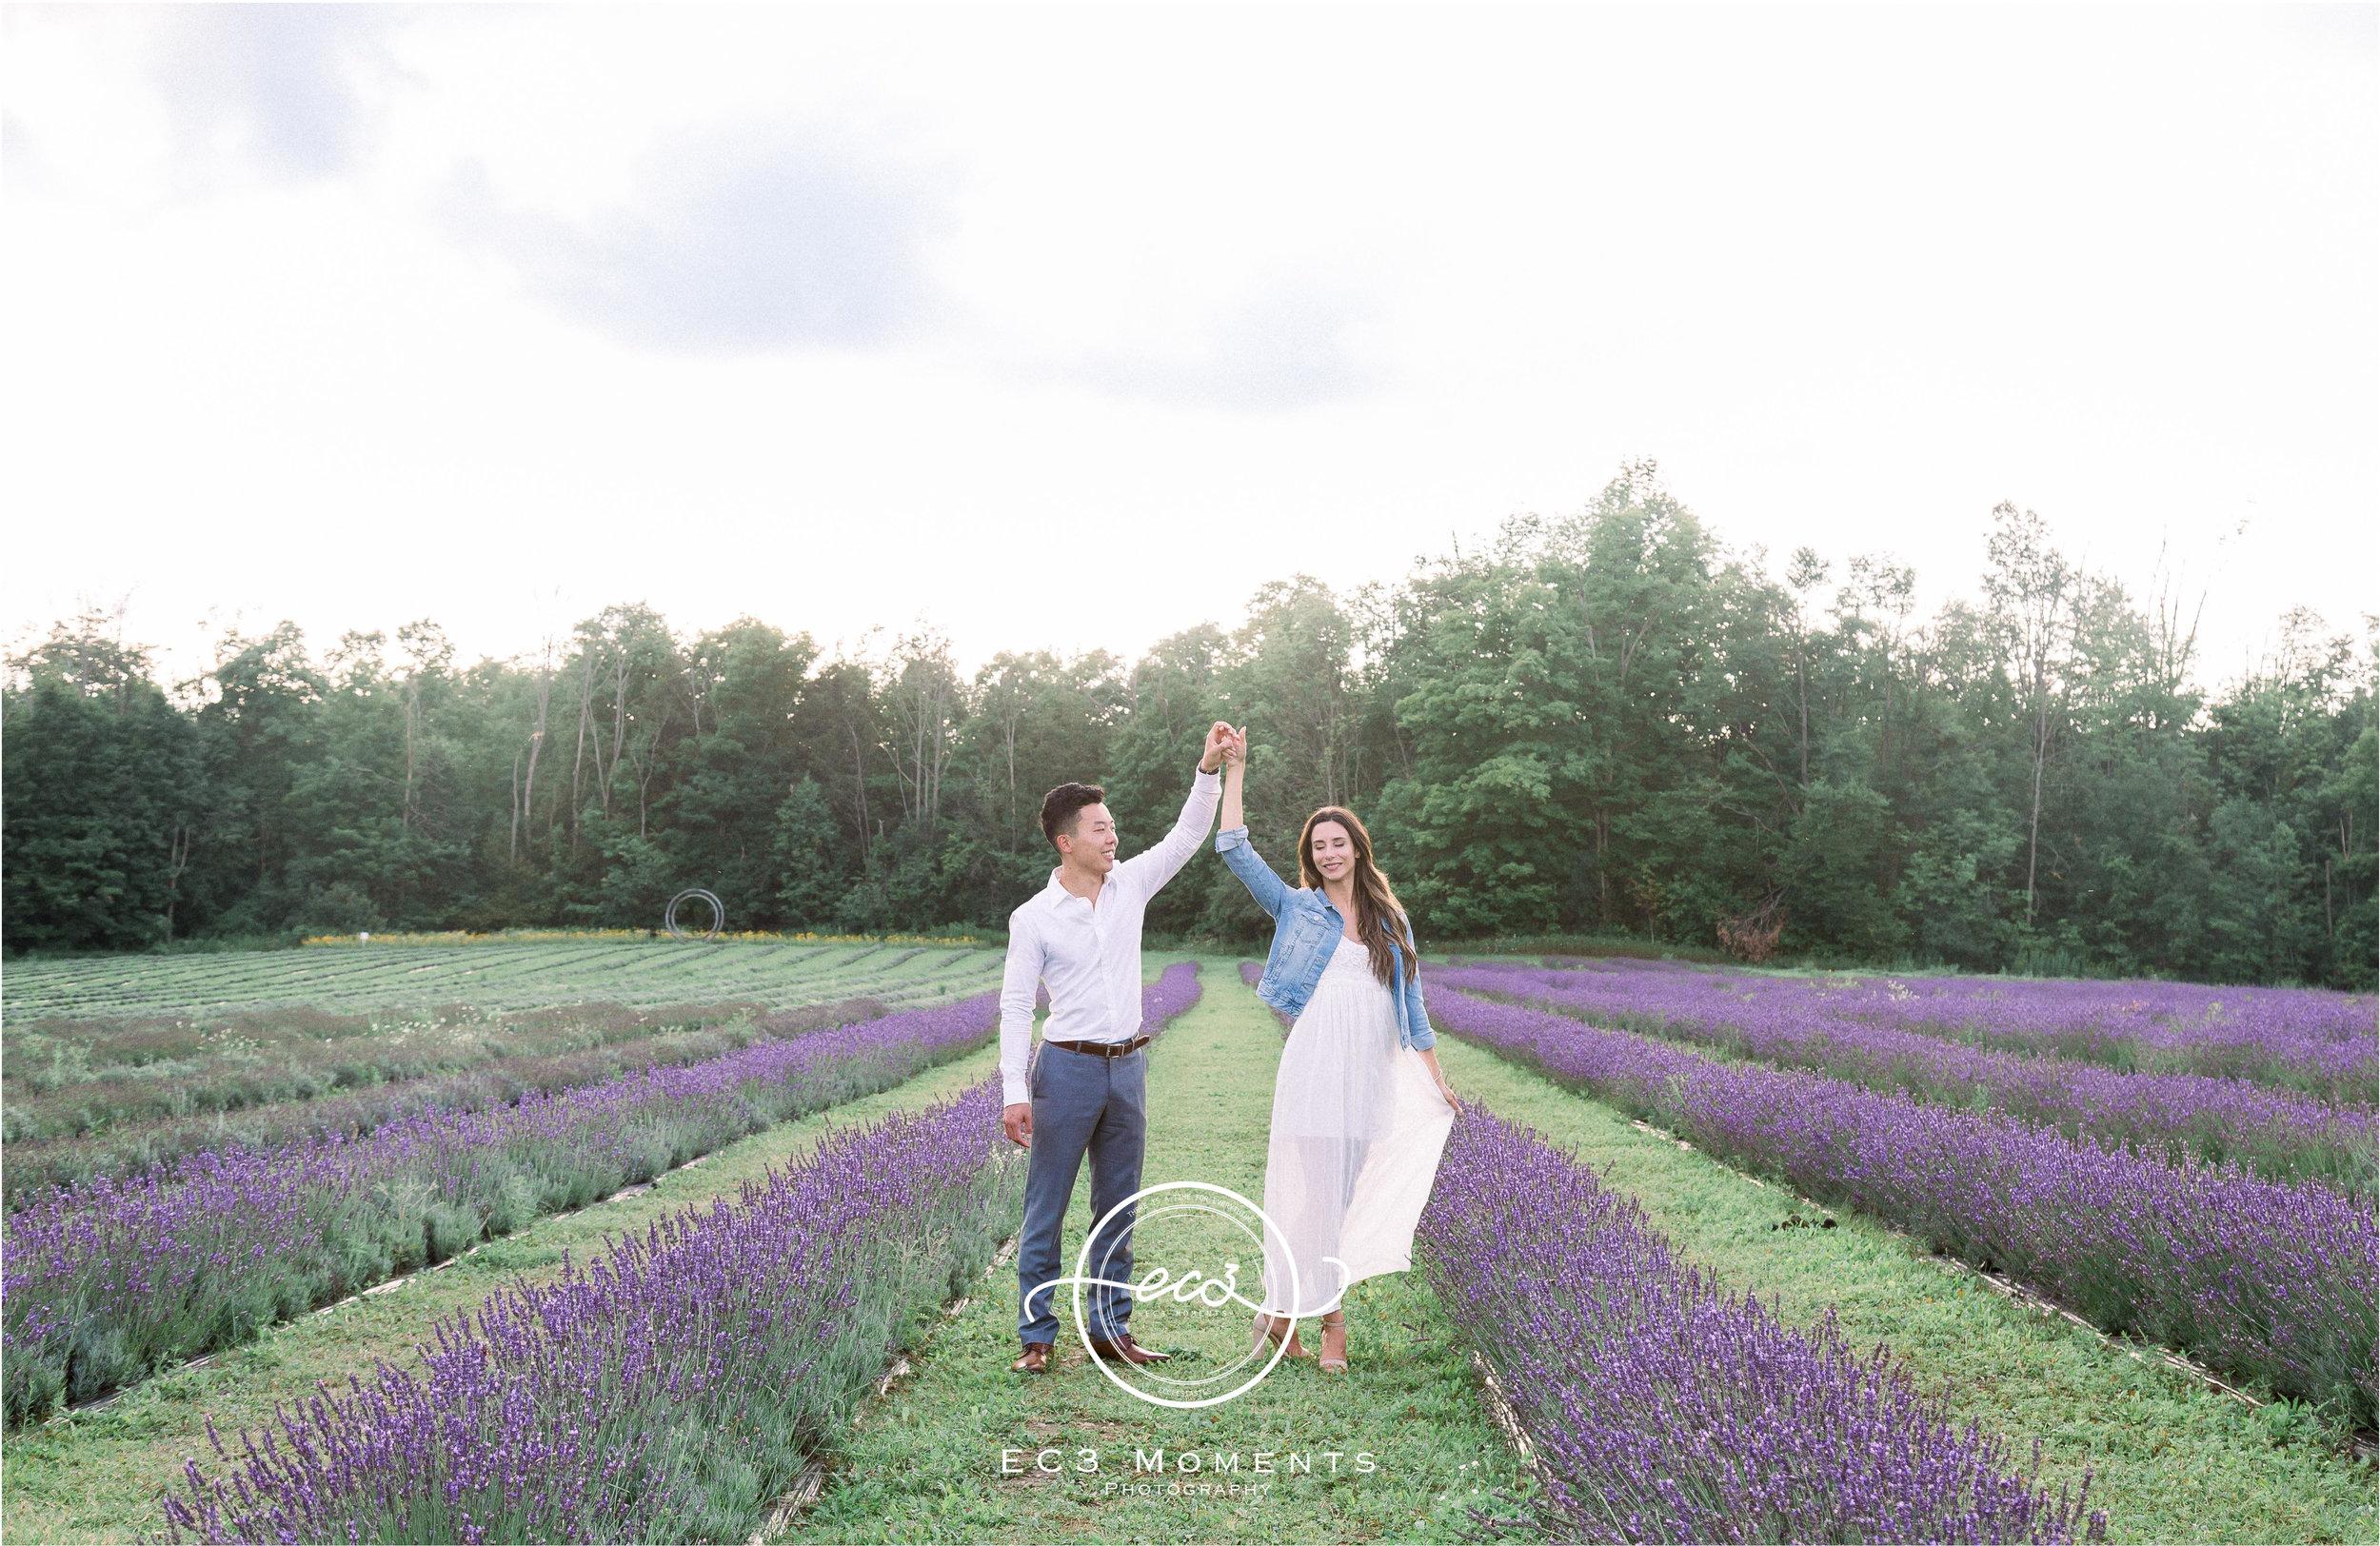 Laura & Ryan Terre Bleu Summer Surprise Proposal 13.jpg